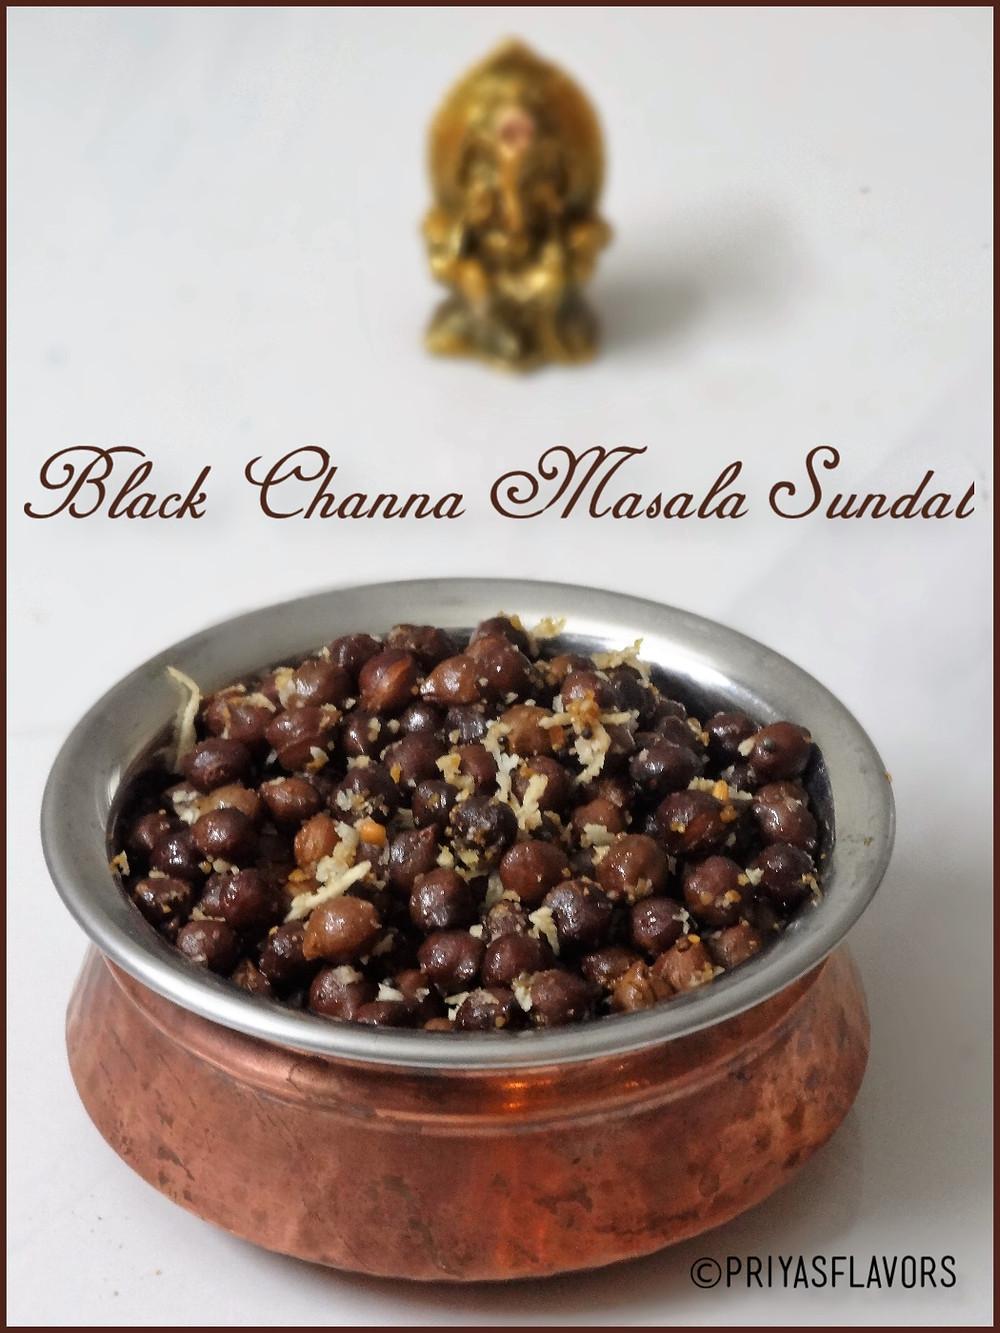 black channa sundal